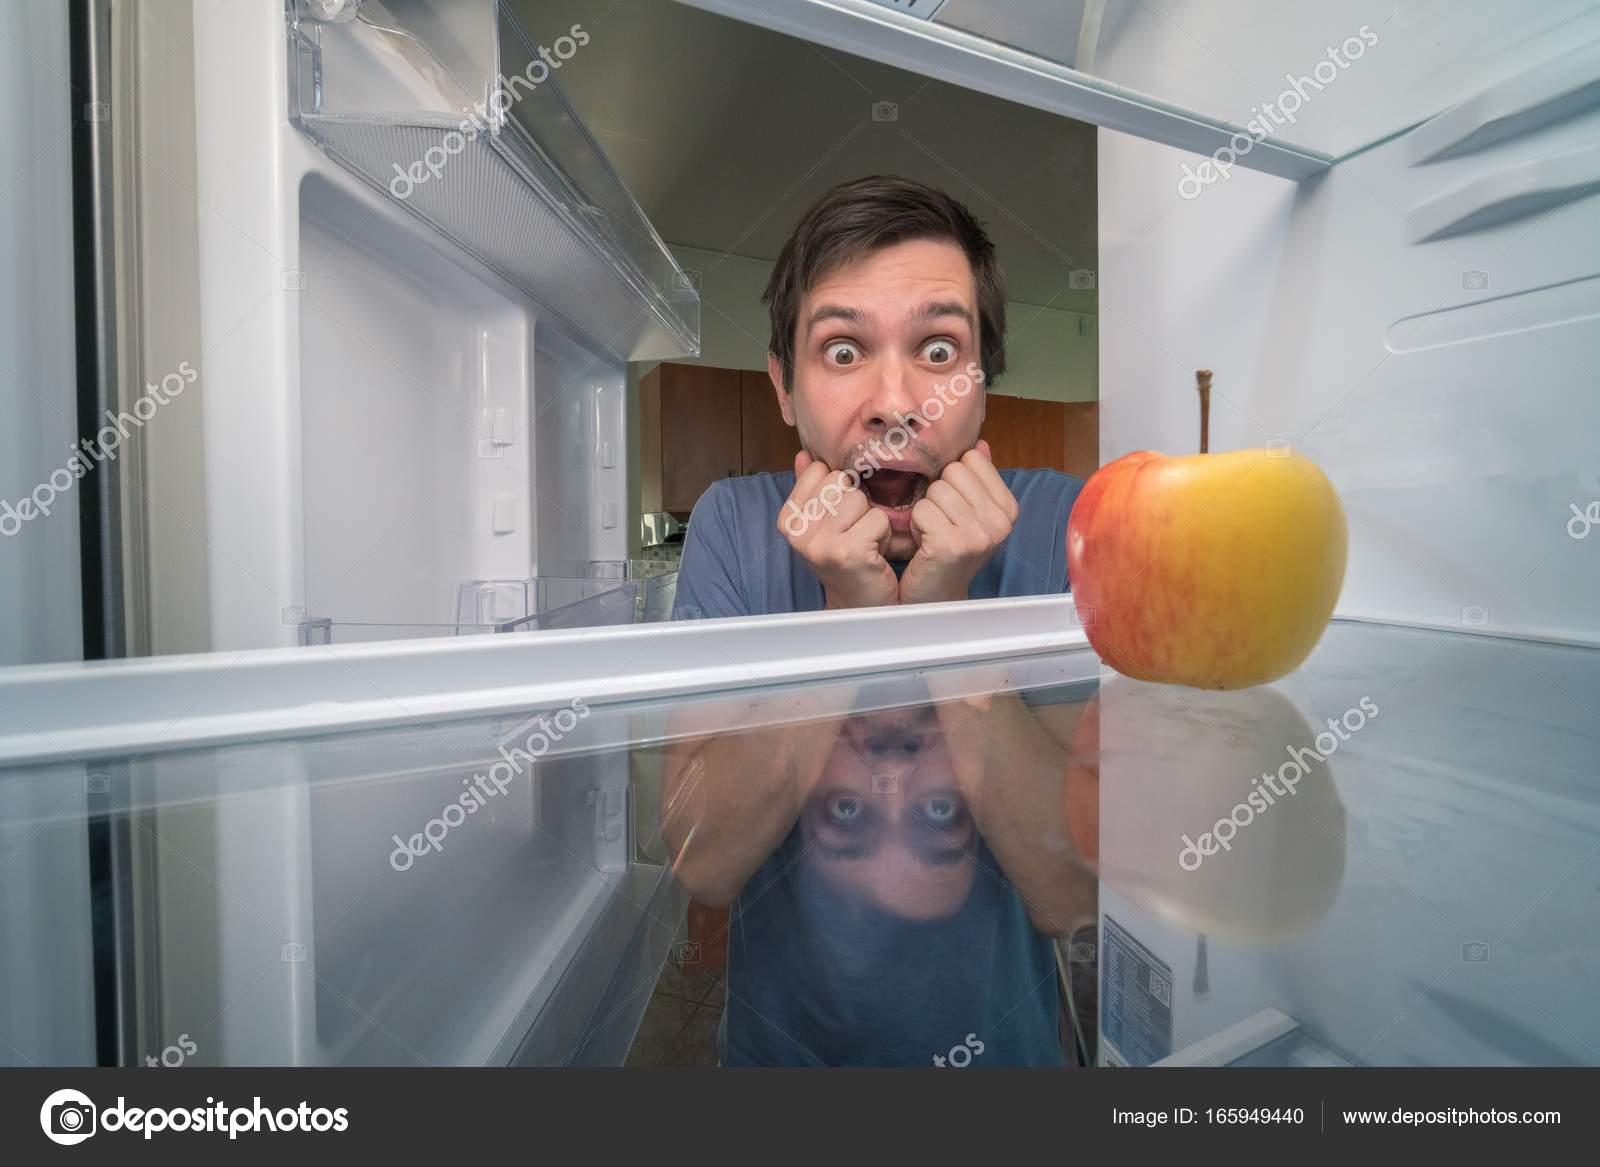 hungrig efter maten